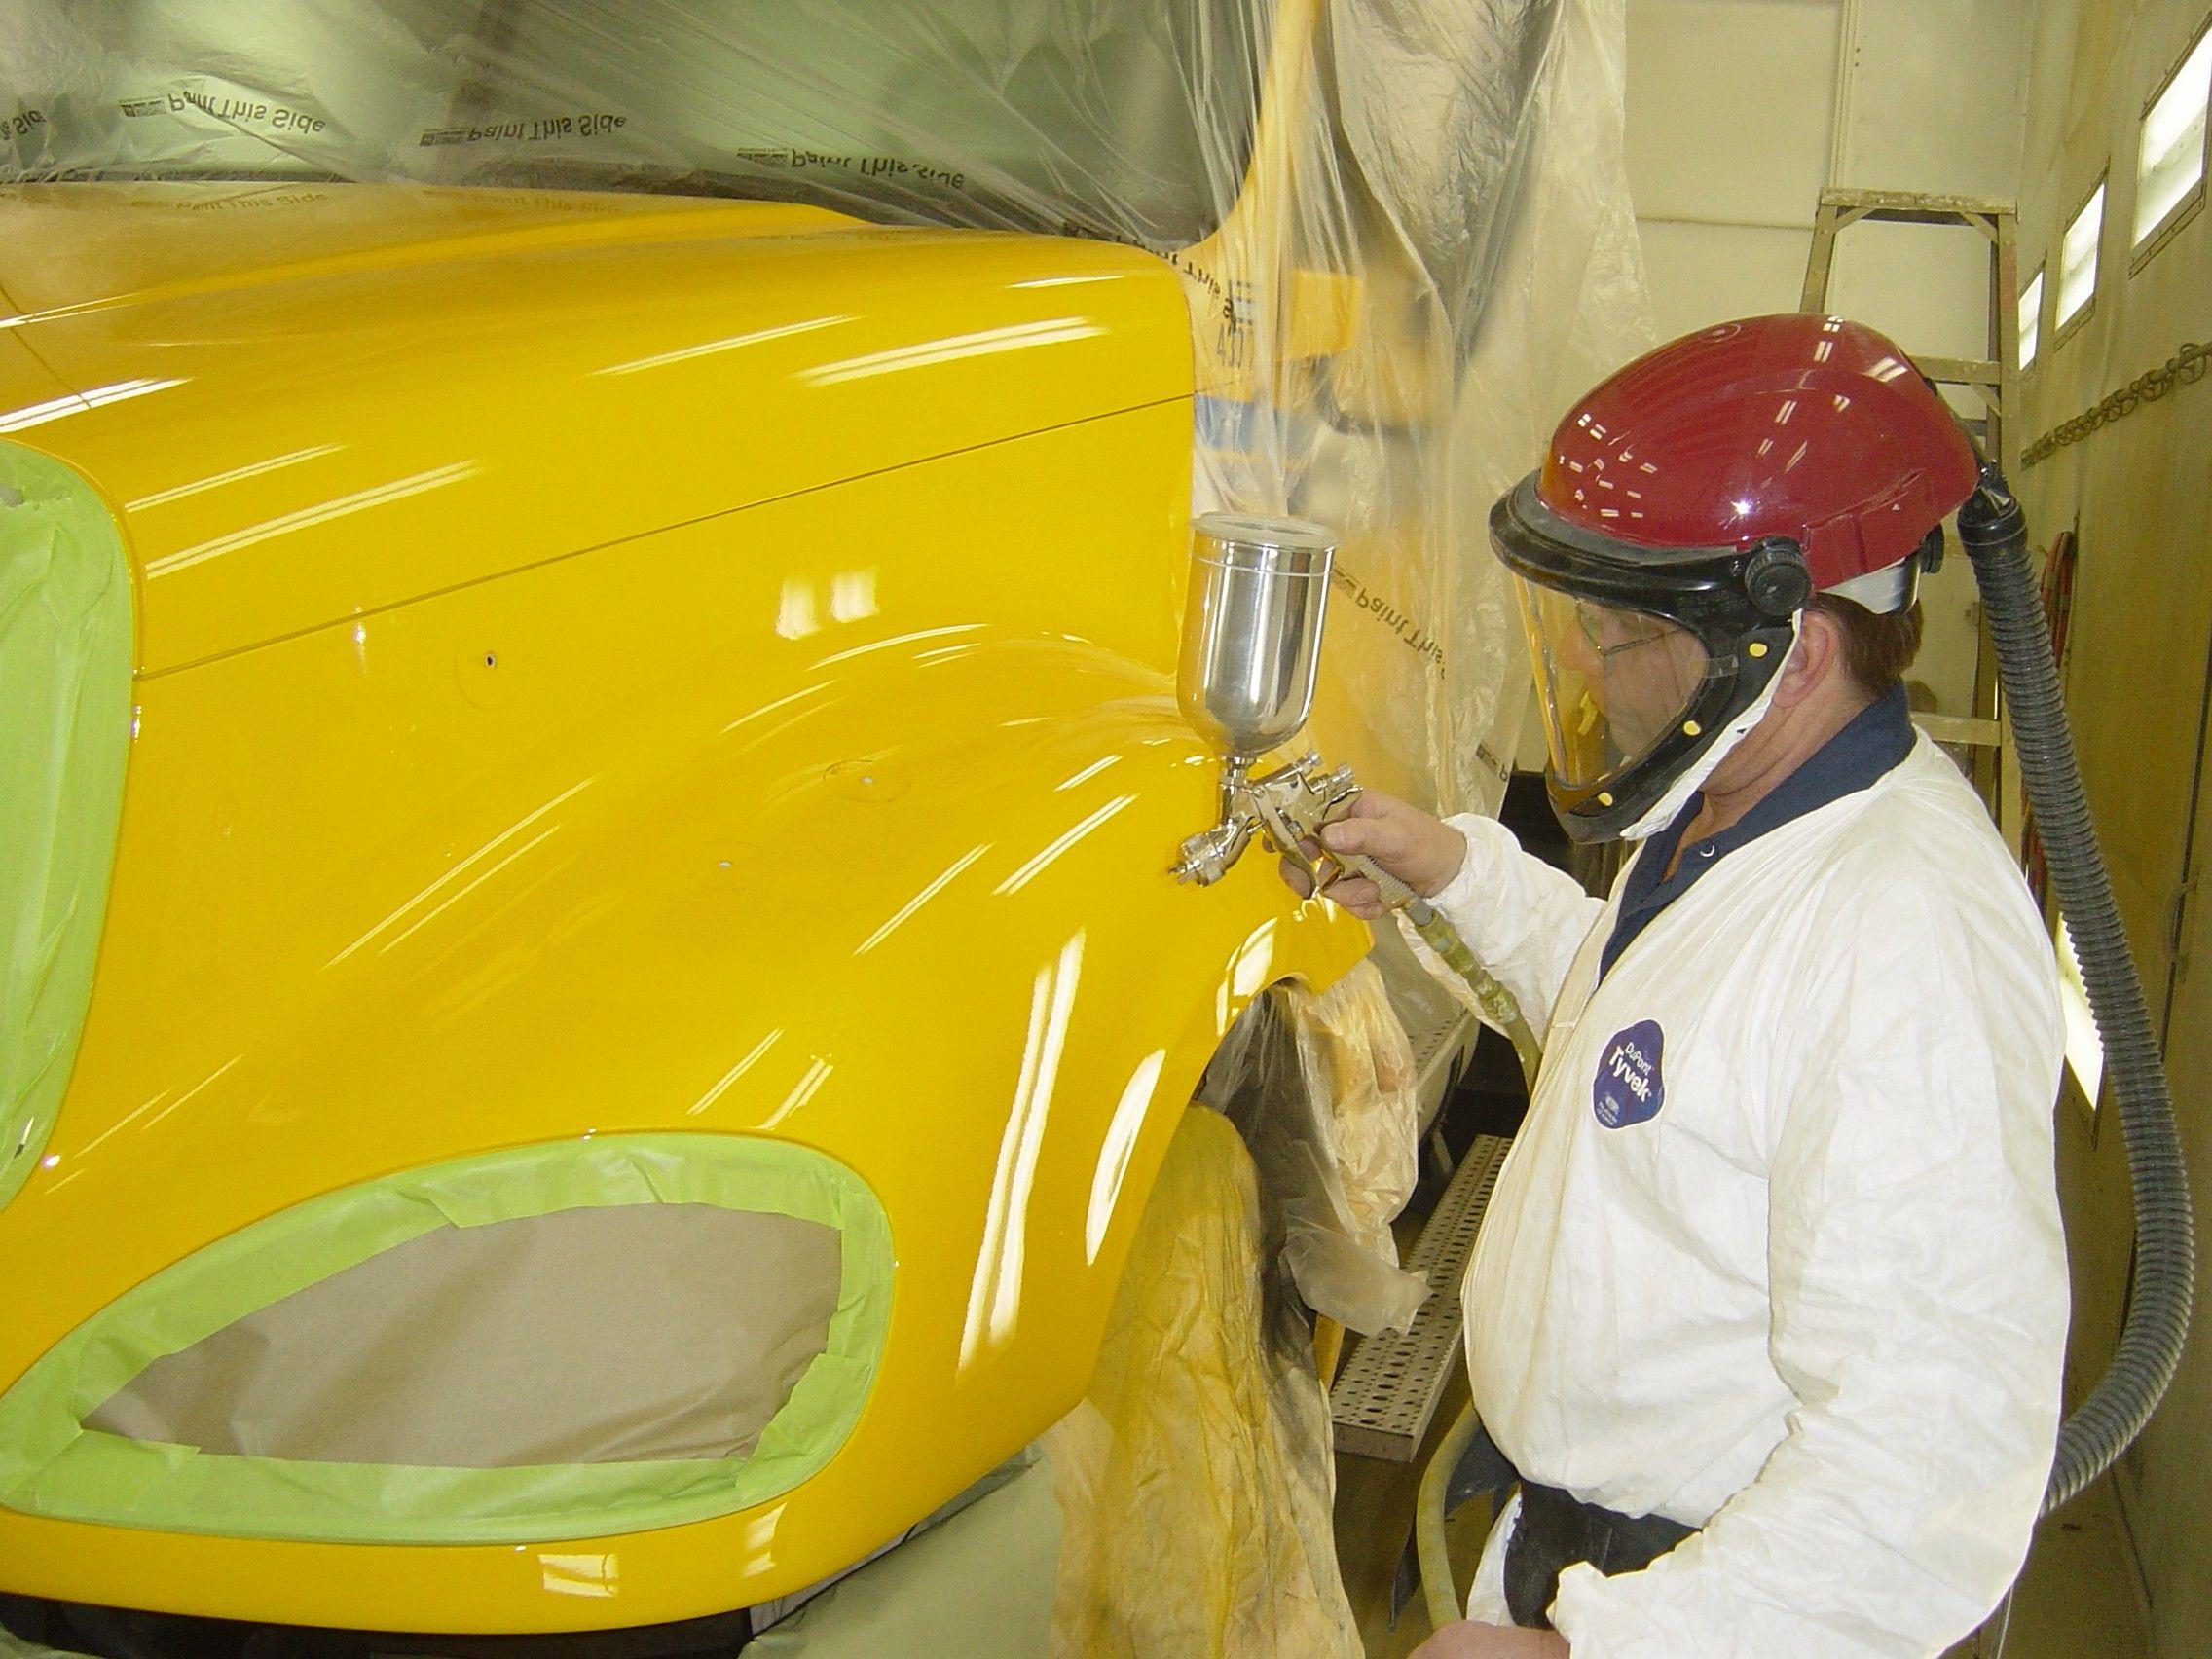 Penske Collision Repair Facilities Receive I-CAR Gold Class Designation